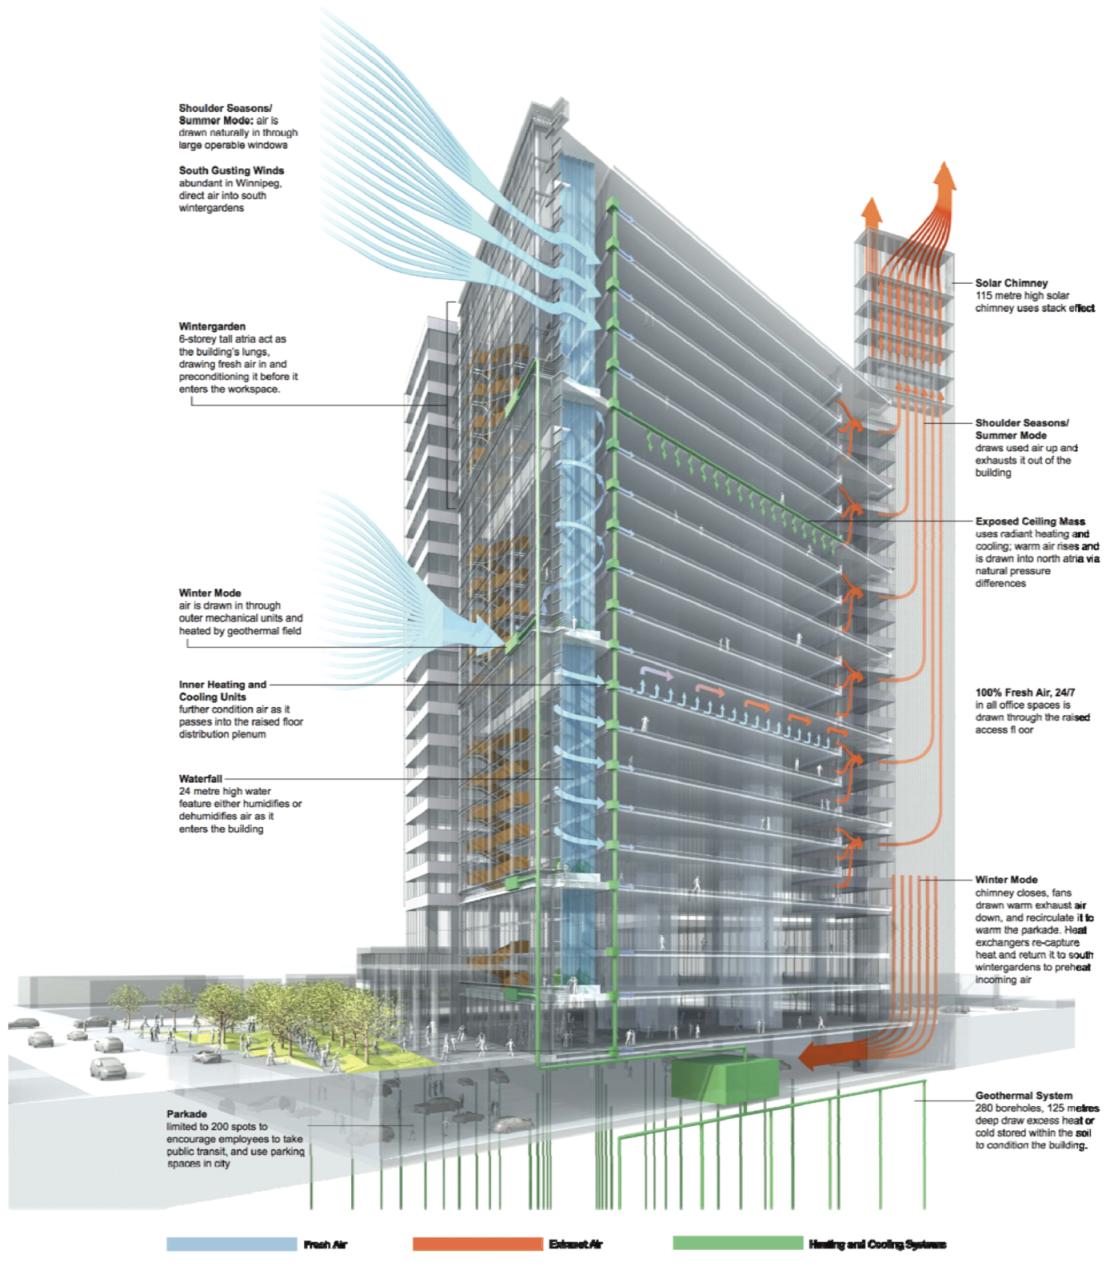 Buildings 03 00689 G010 Png 1114 1278 Energy Efficient